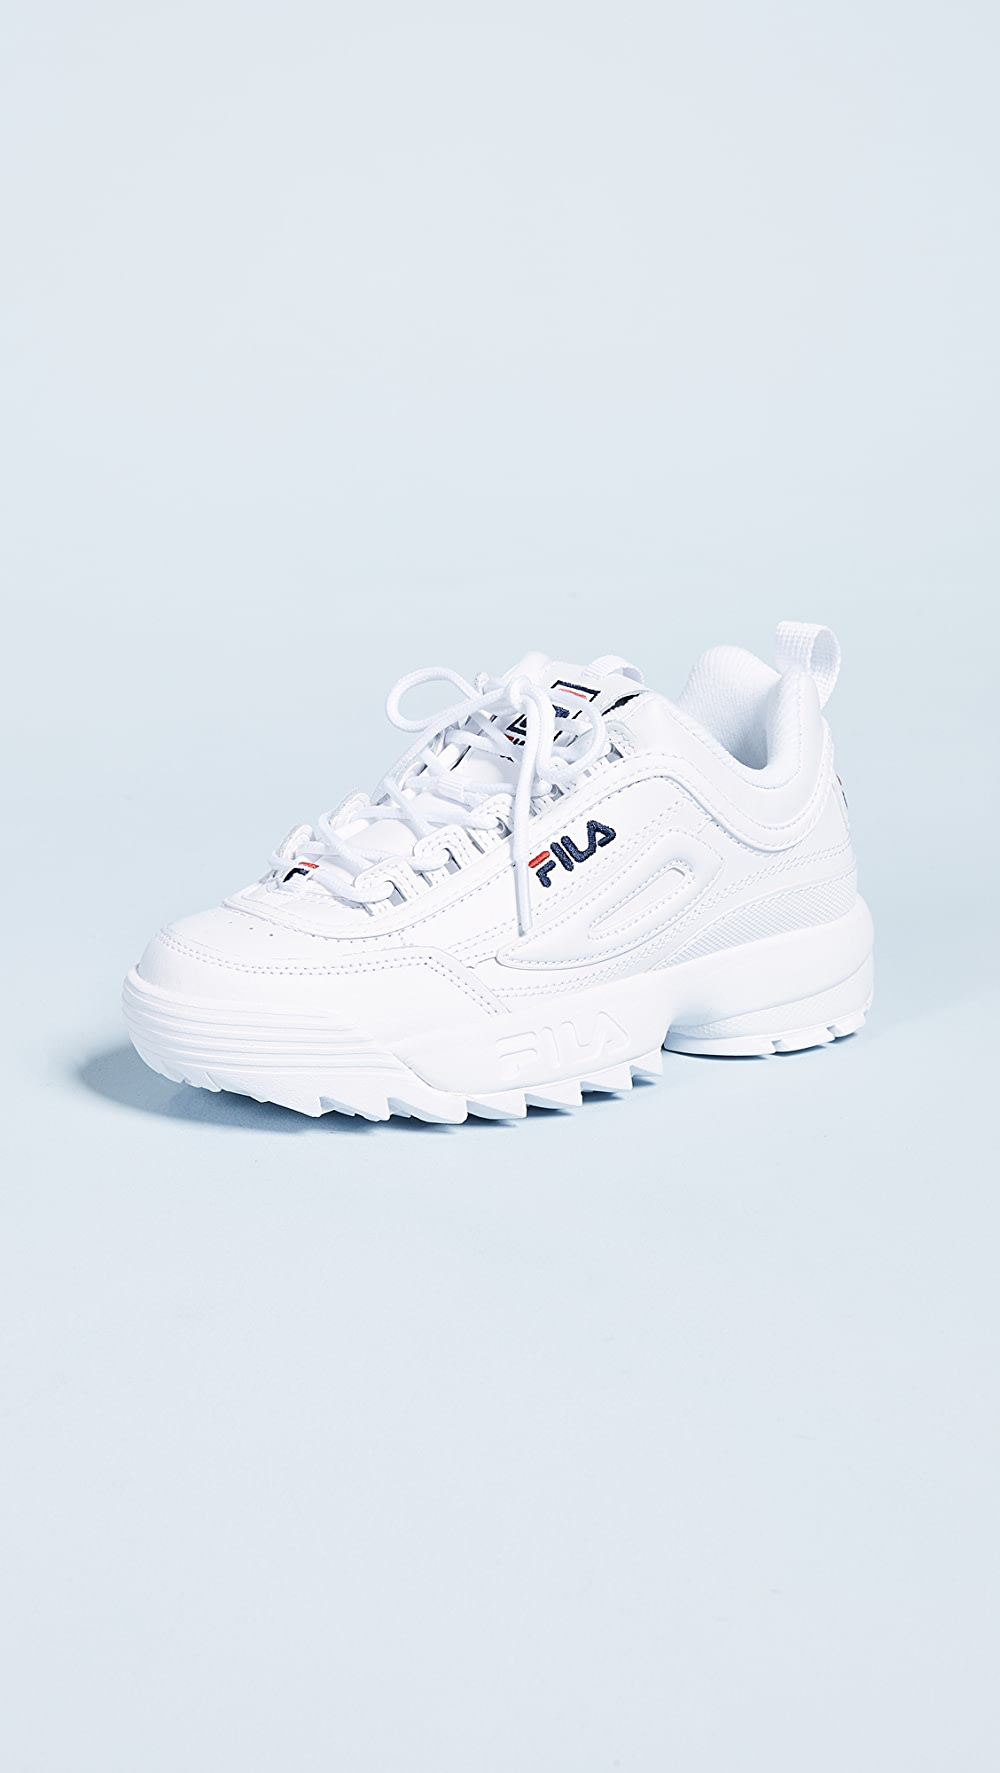 Fila Disruptor II Premium Sneakers ShopbopNy å selge Shopbop New To Sale